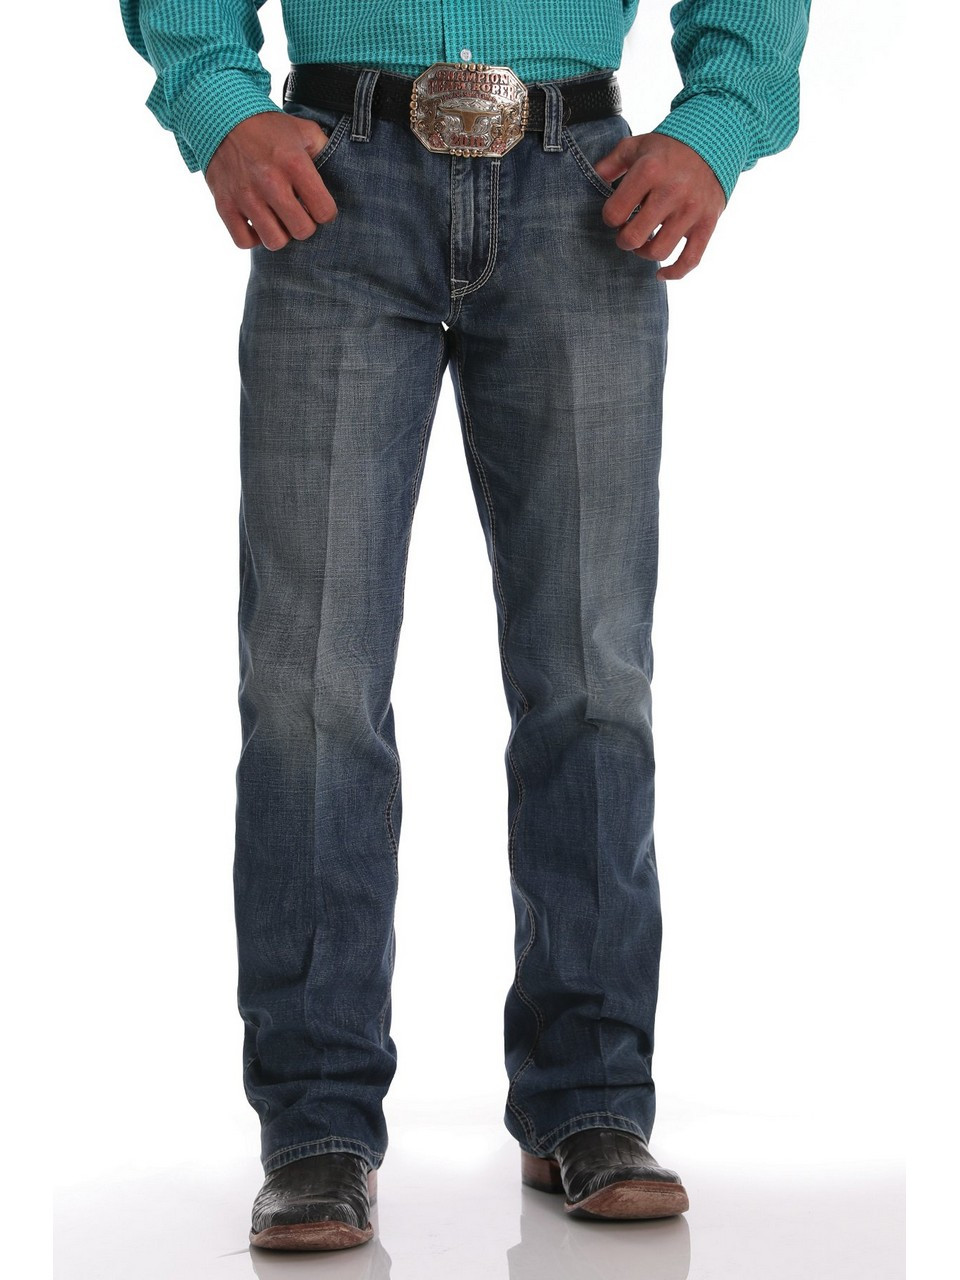 Calligrafia segretario condizione indispensabile  Cinch® Mens' Relaxed Fit Carter 2.0 Medium Stonewash Jeans - Eli's Western  Wear